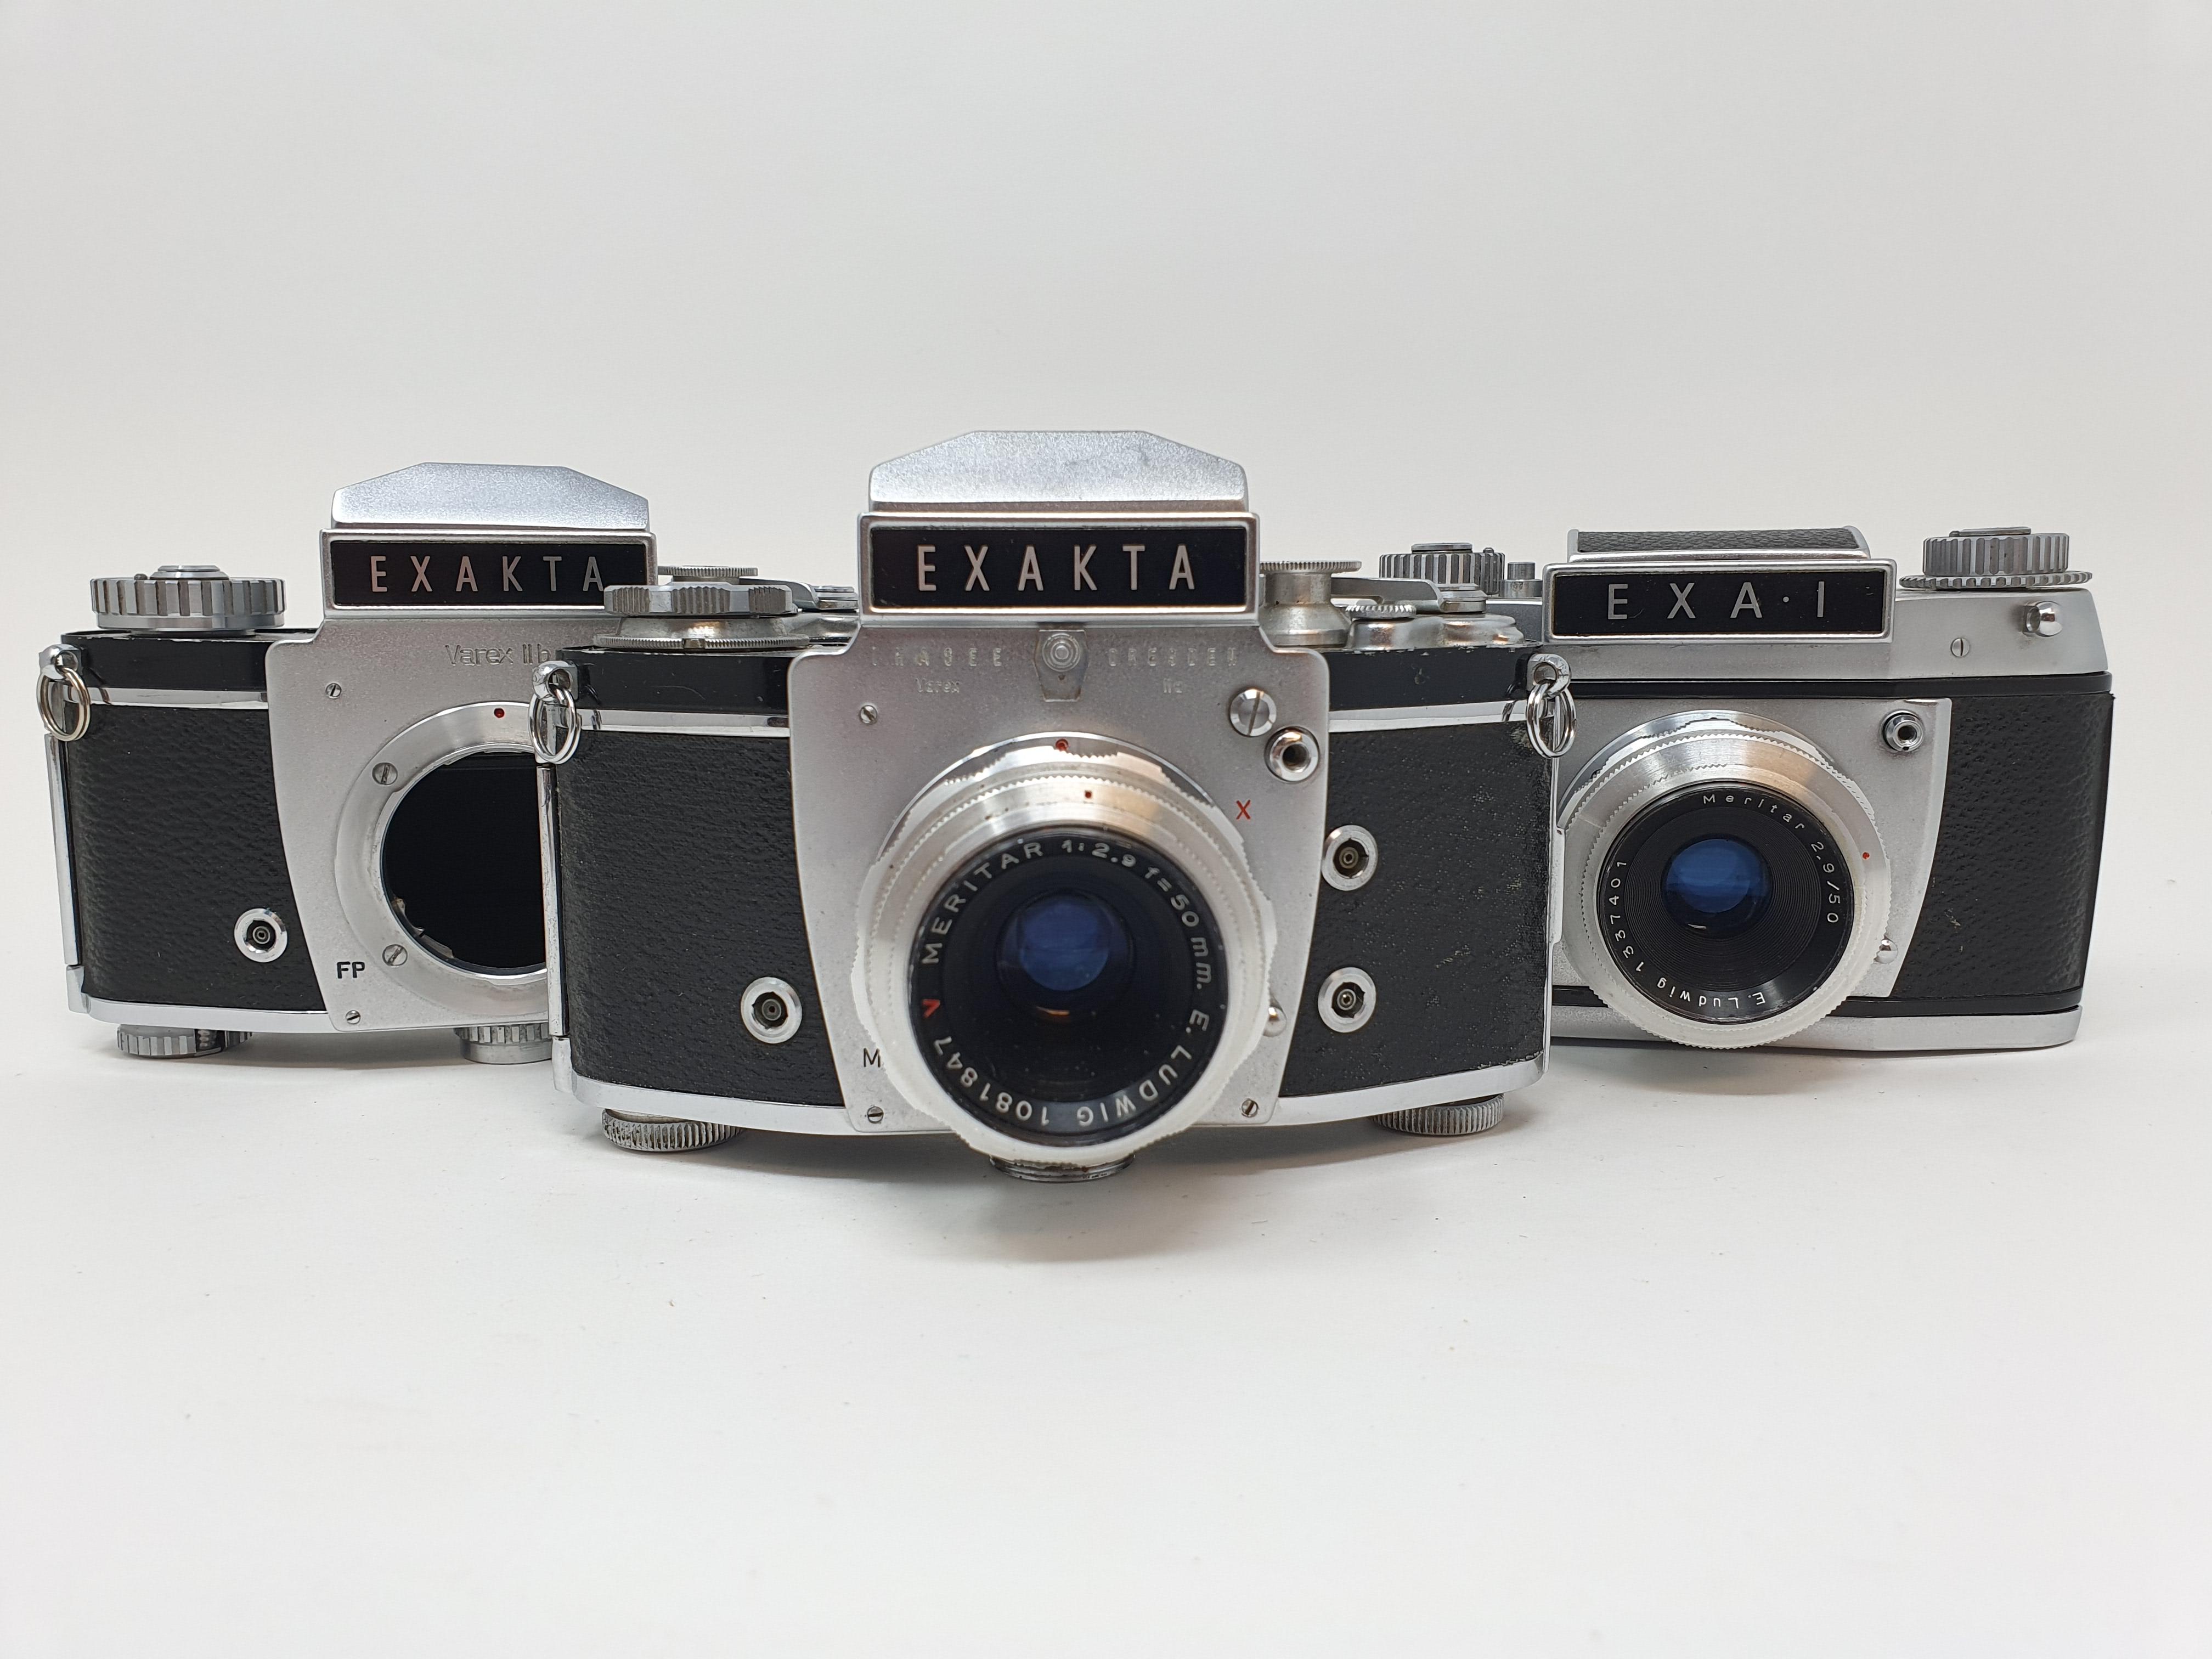 An Exakta Varex IIa camera, Varex IIb camera body, and an Exa. I (3) Provenance: Part of a vast